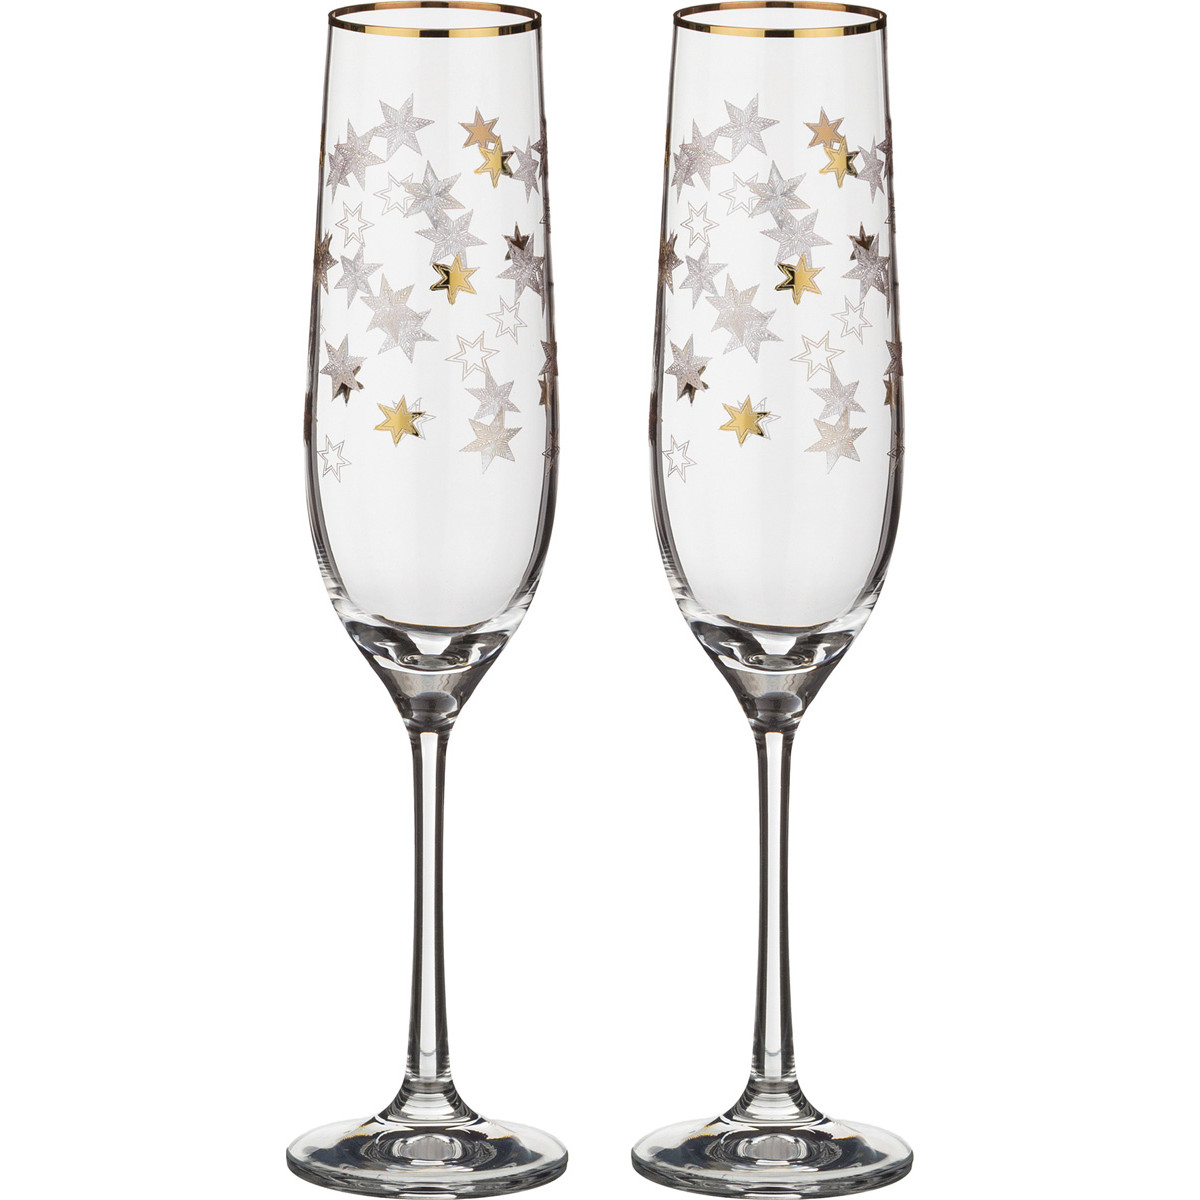 {} Bohemia Crystal Набор бокалов для шампанского Pneuma  (24 см - 2 шт) набор для специй crystal bohemia тыква 2 предмета